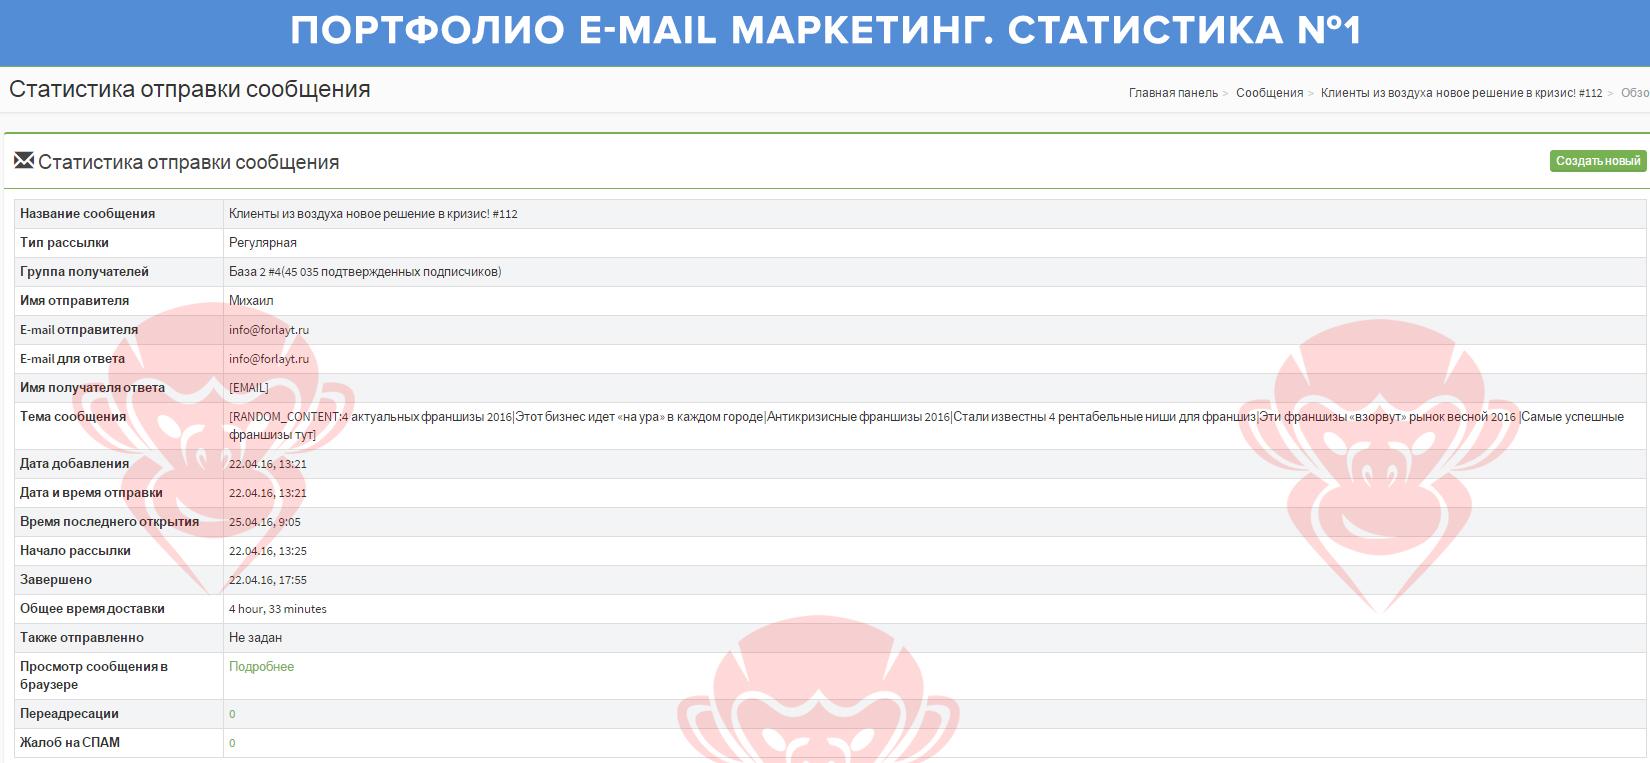 Портфолио E-mail маркетинг 1